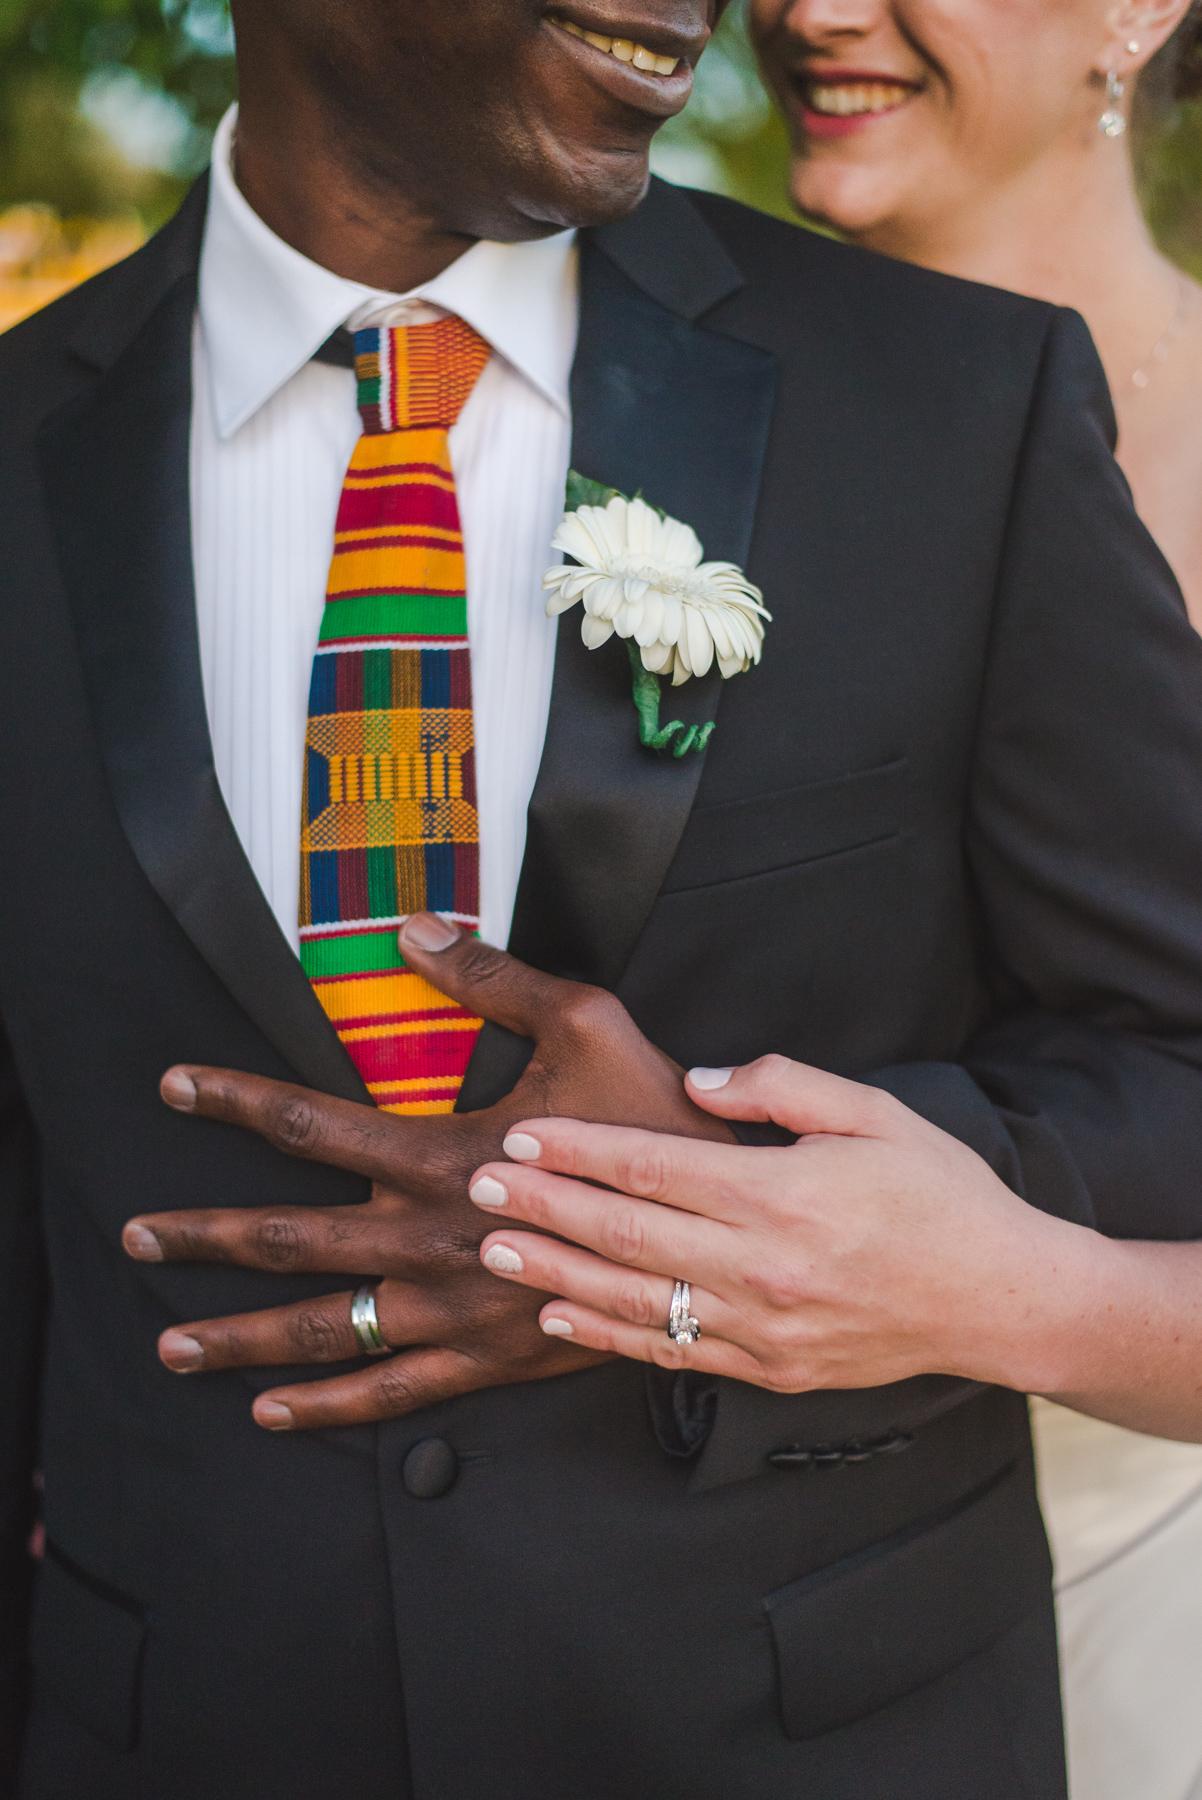 multi-racial bride and groom | lakewood, colorado intimate wedding | keeping composure photography